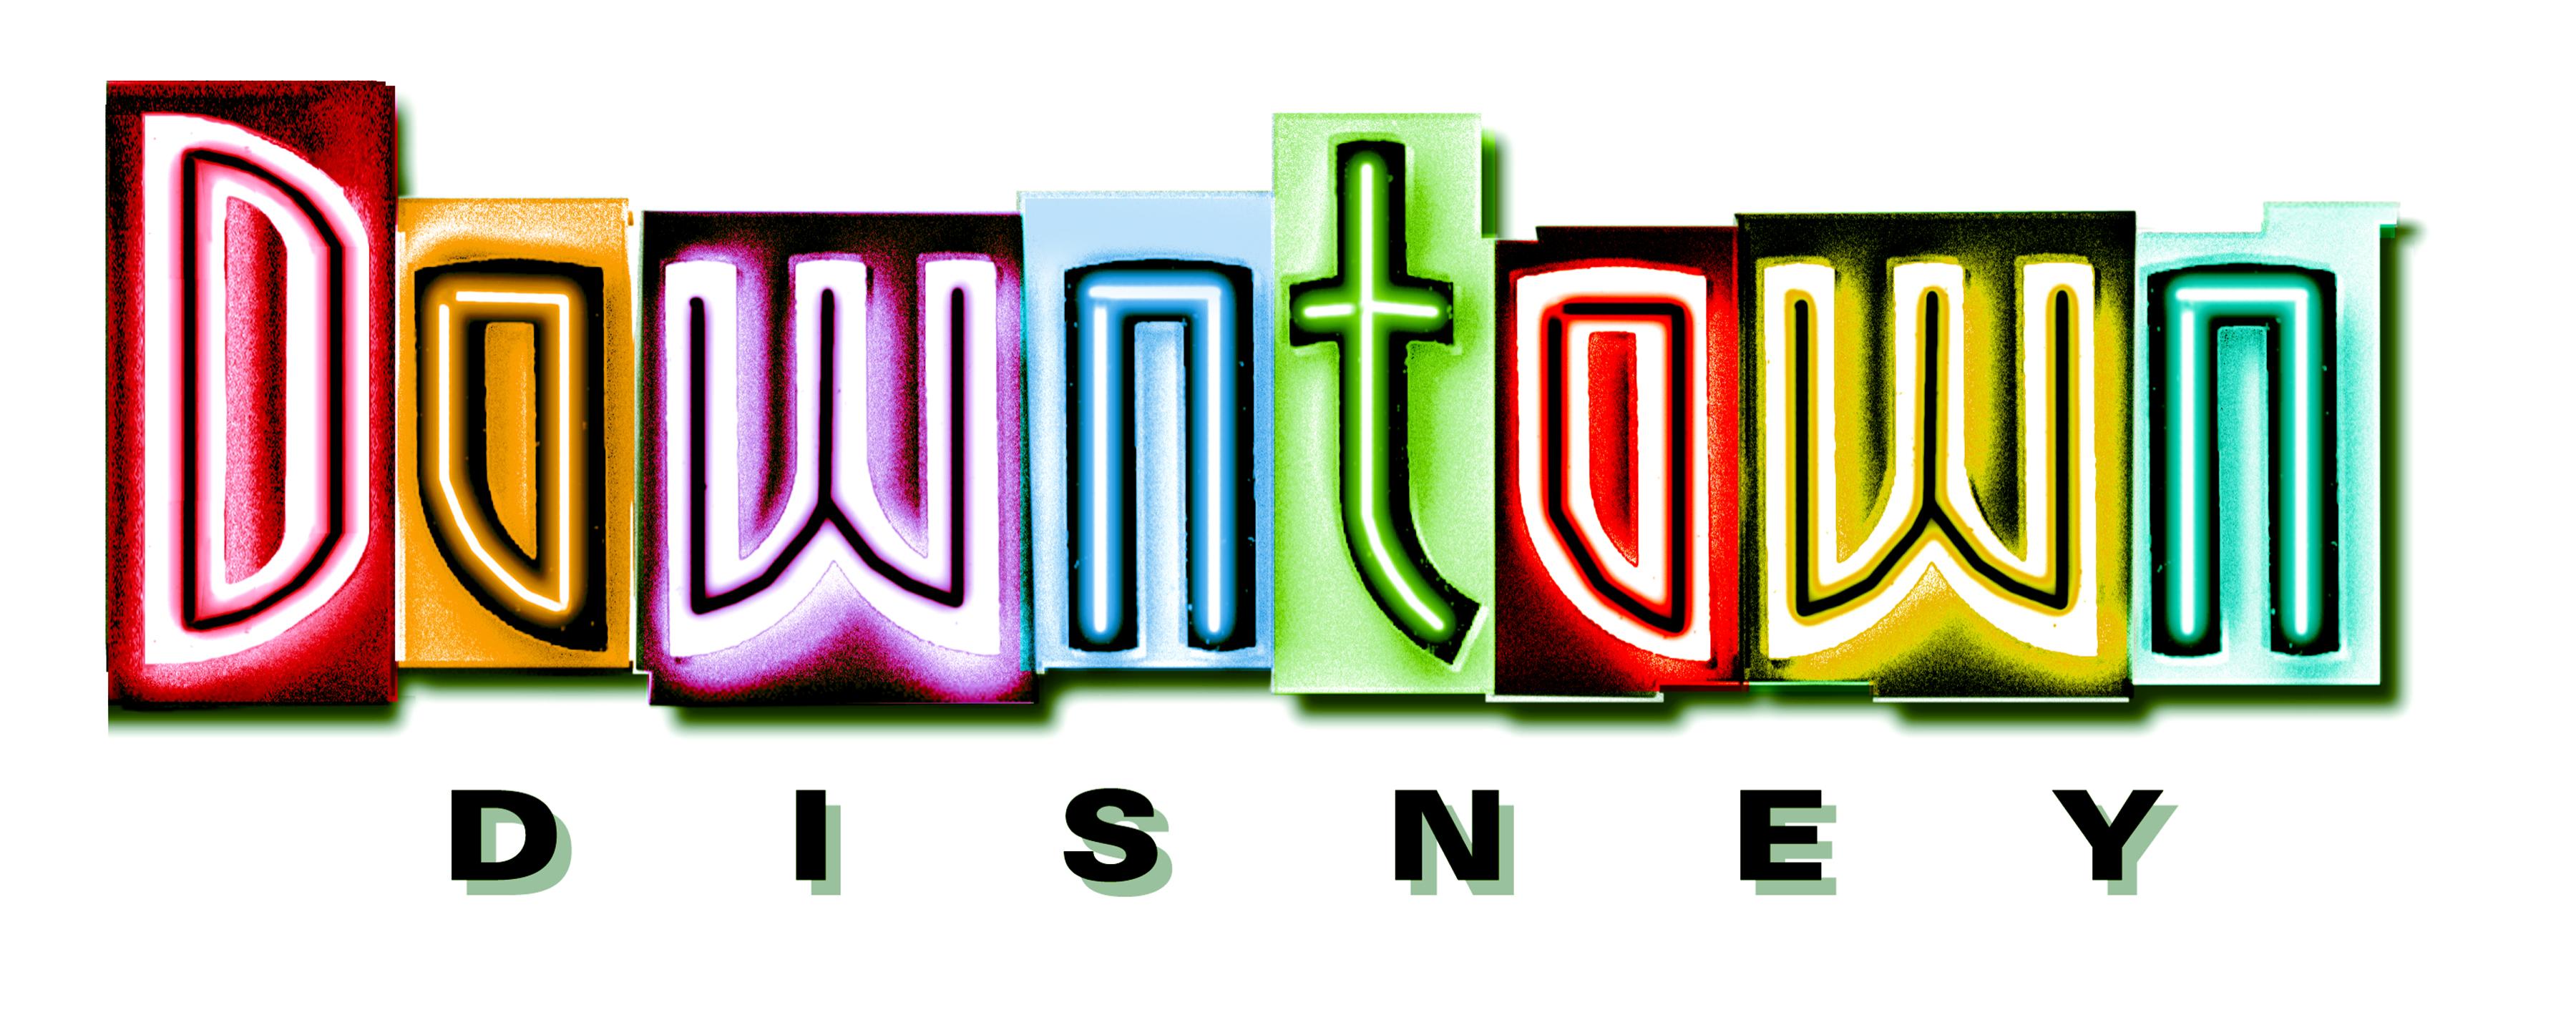 Disney world magic kingdom clipart vector freeuse download Magic kingdom clipart - ClipartFest vector freeuse download